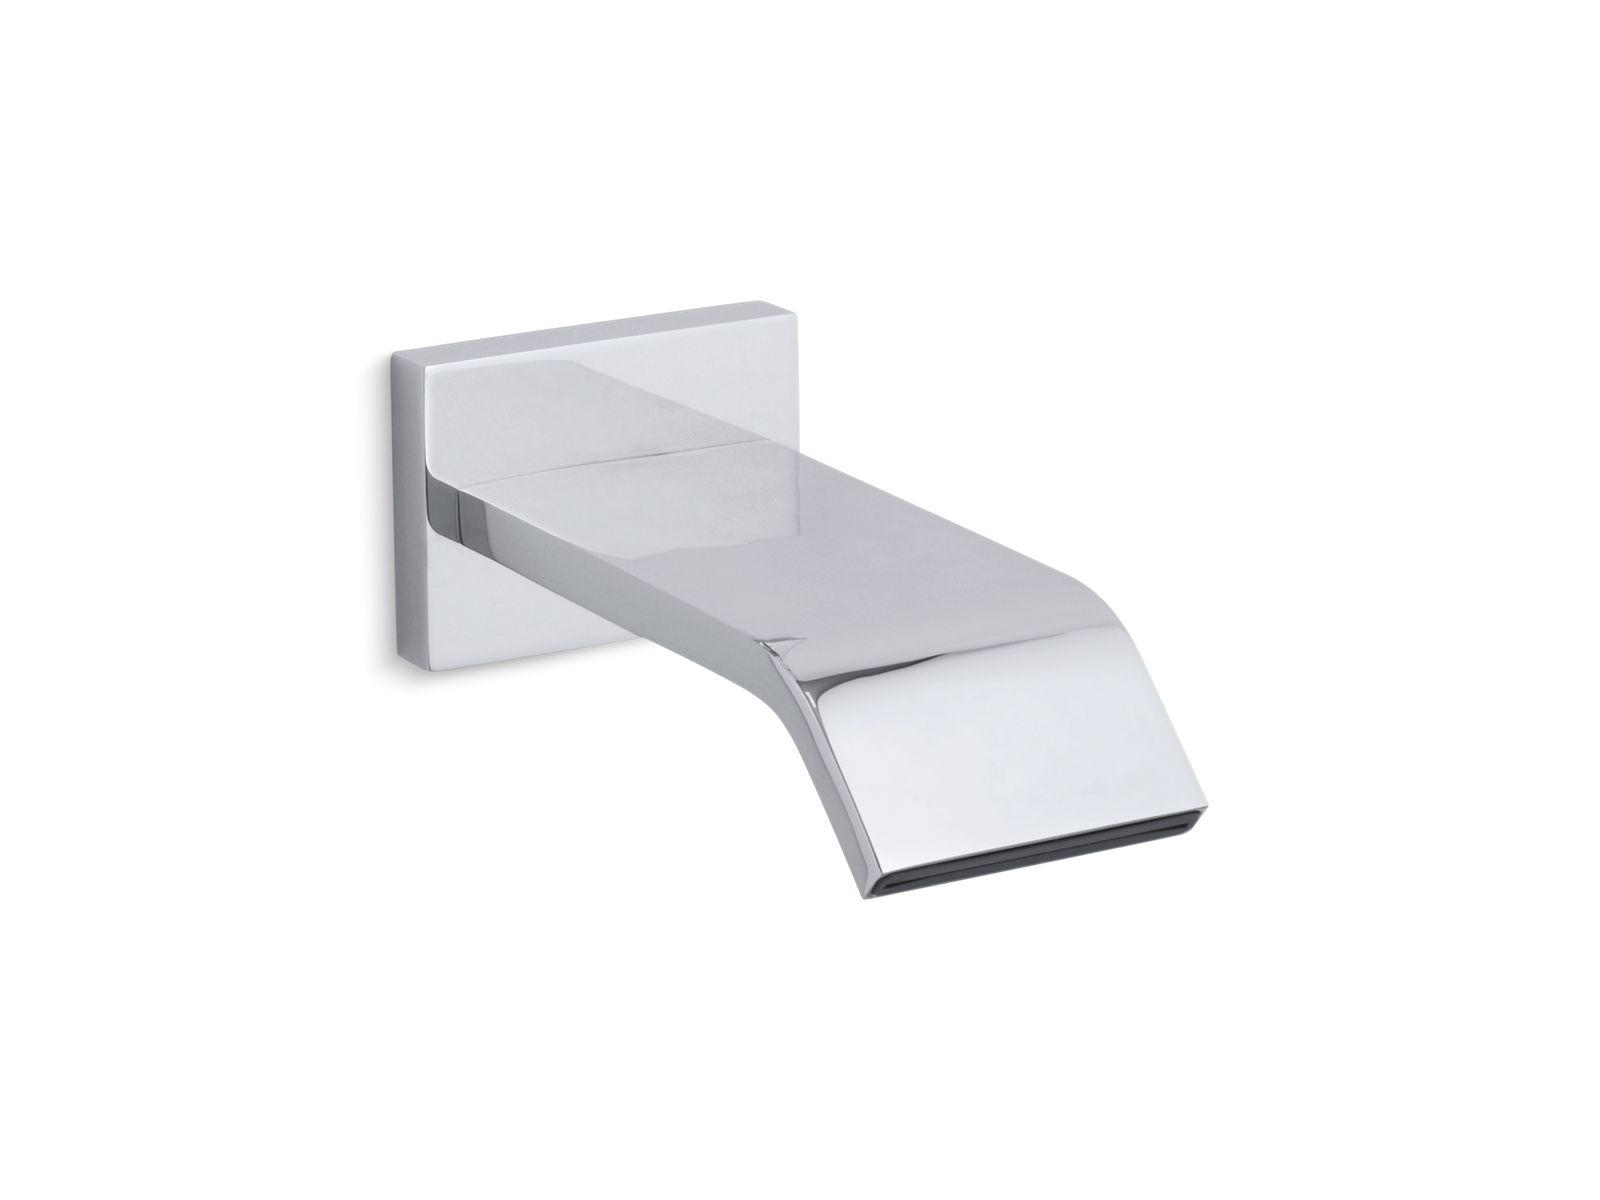 k 14676 loure wall mount 9 3 4 inch non diverter bath spout kohler